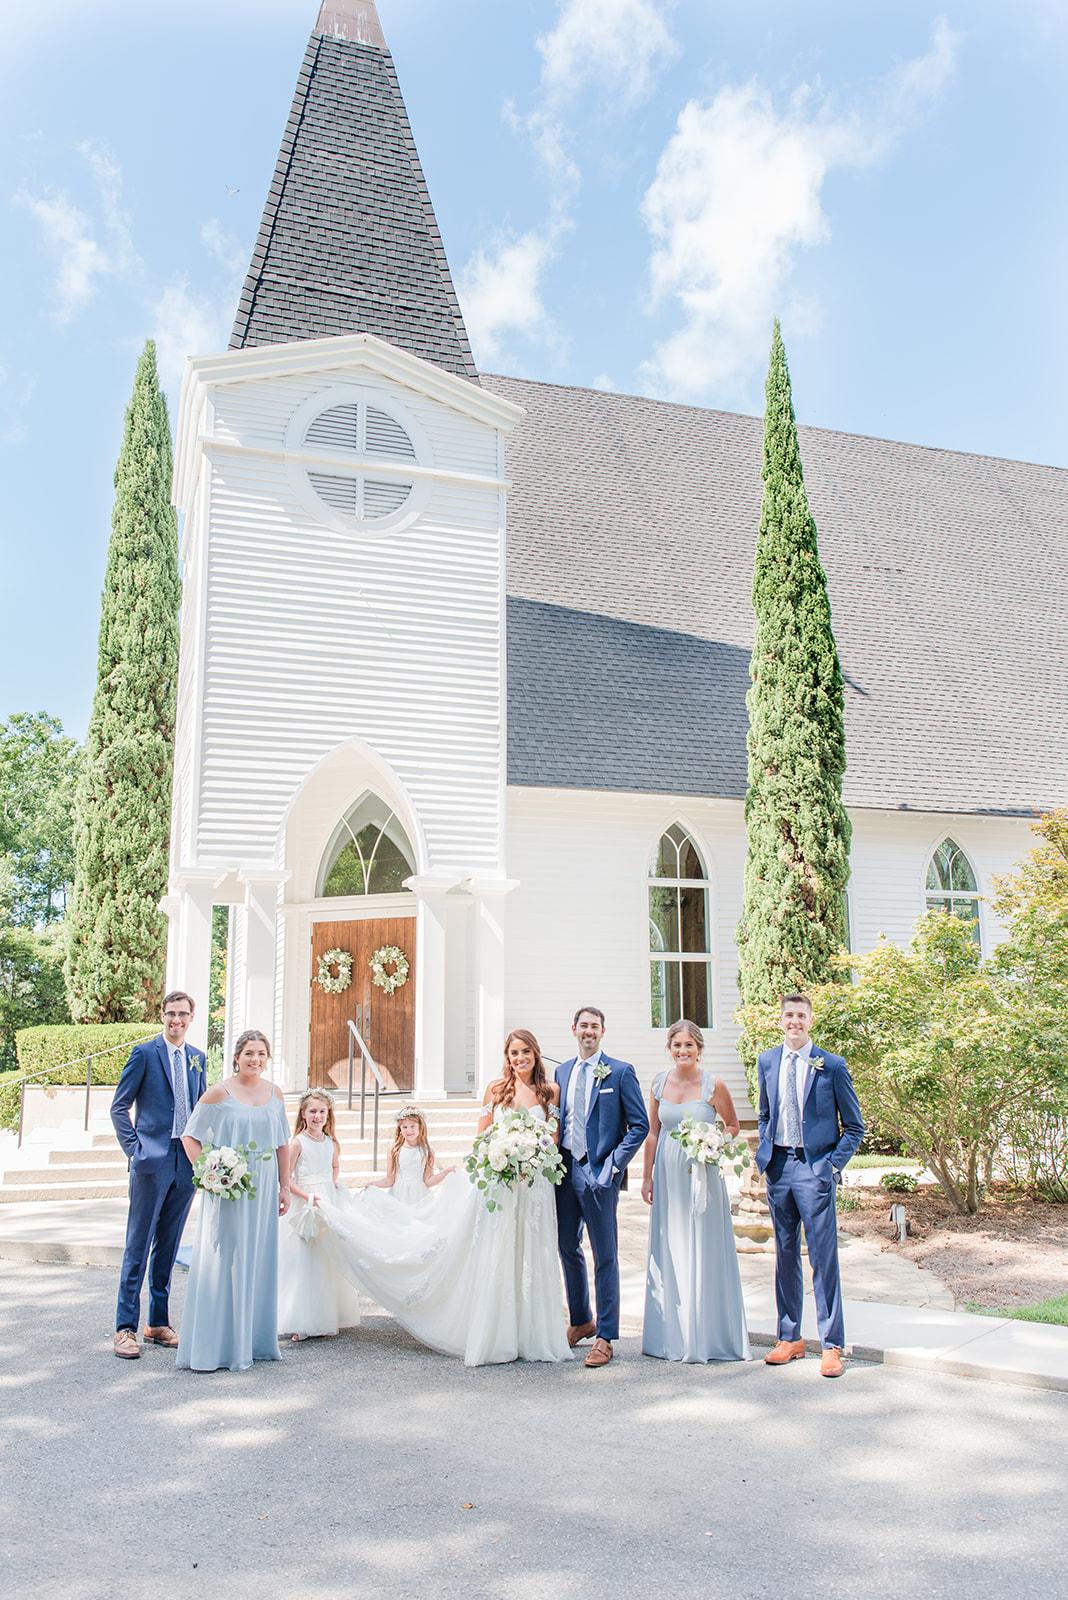 Fairhope AL destination wedding party poses outside church